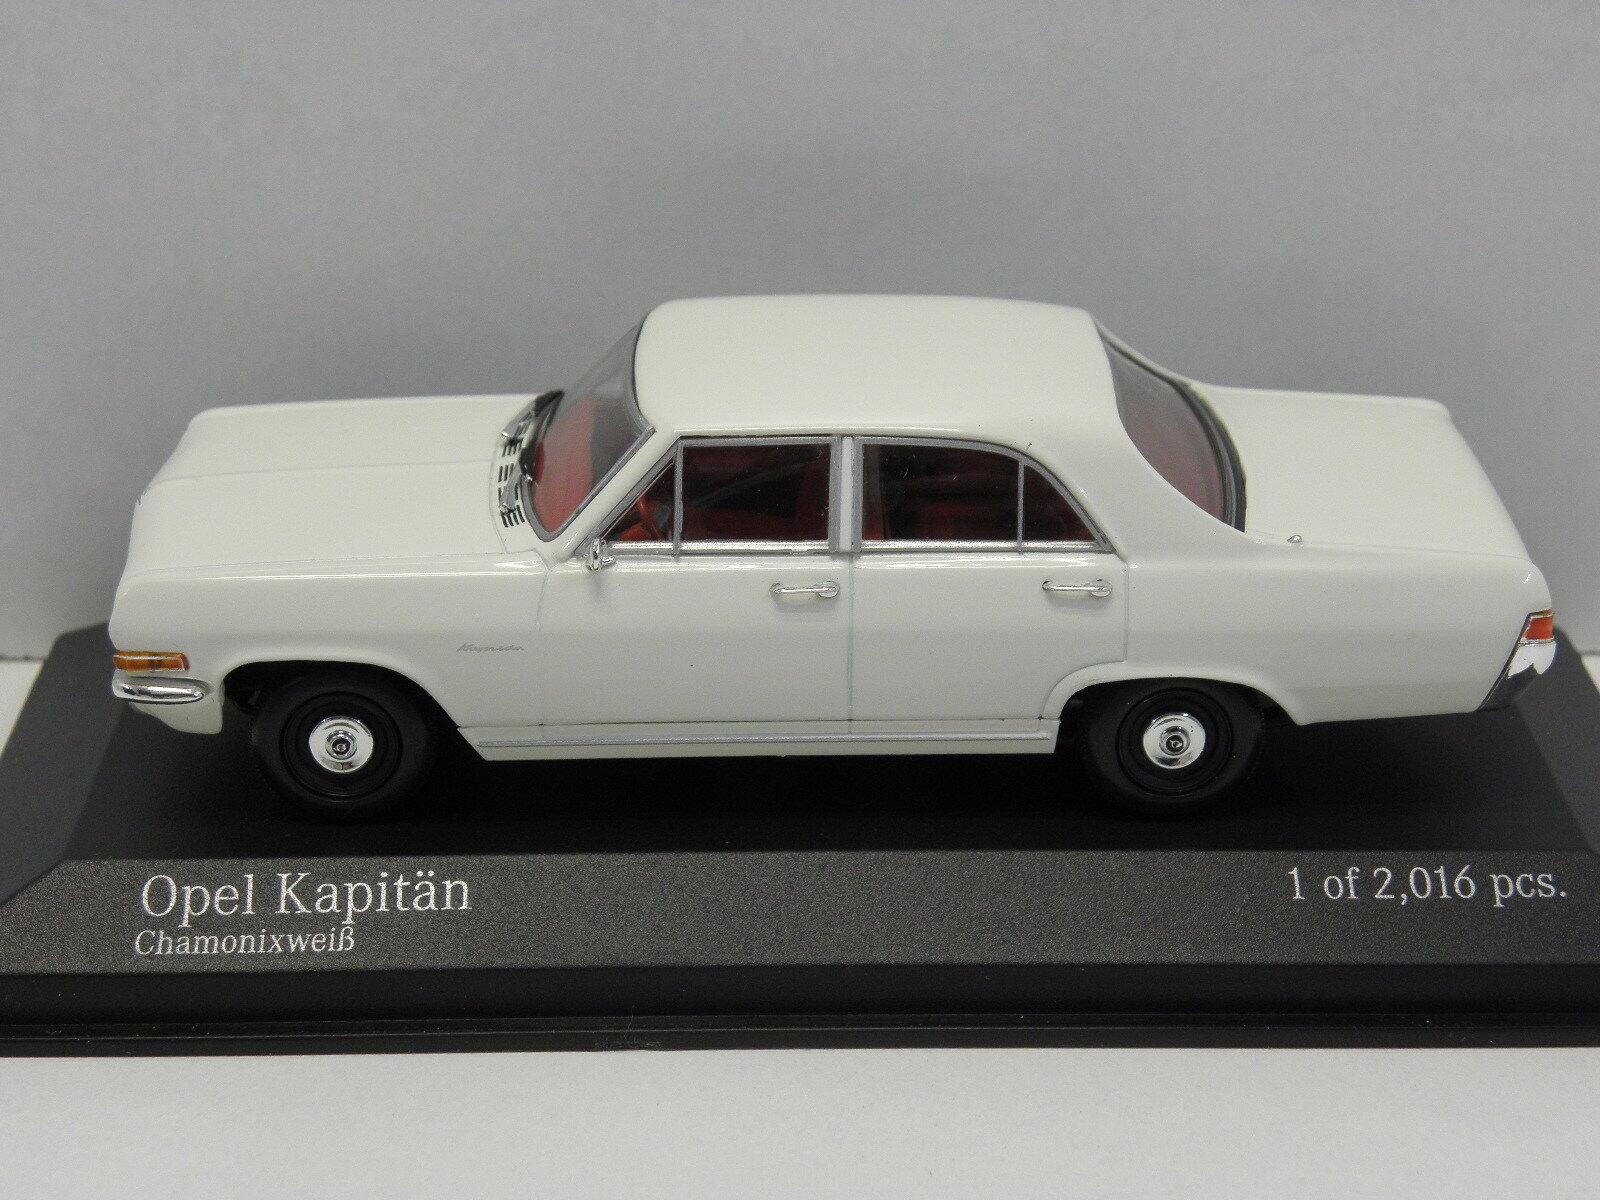 MINICHAMPS 400048000 Sammelmodell Opel Kapitän 1964 M.1 43 43 43 7b565c